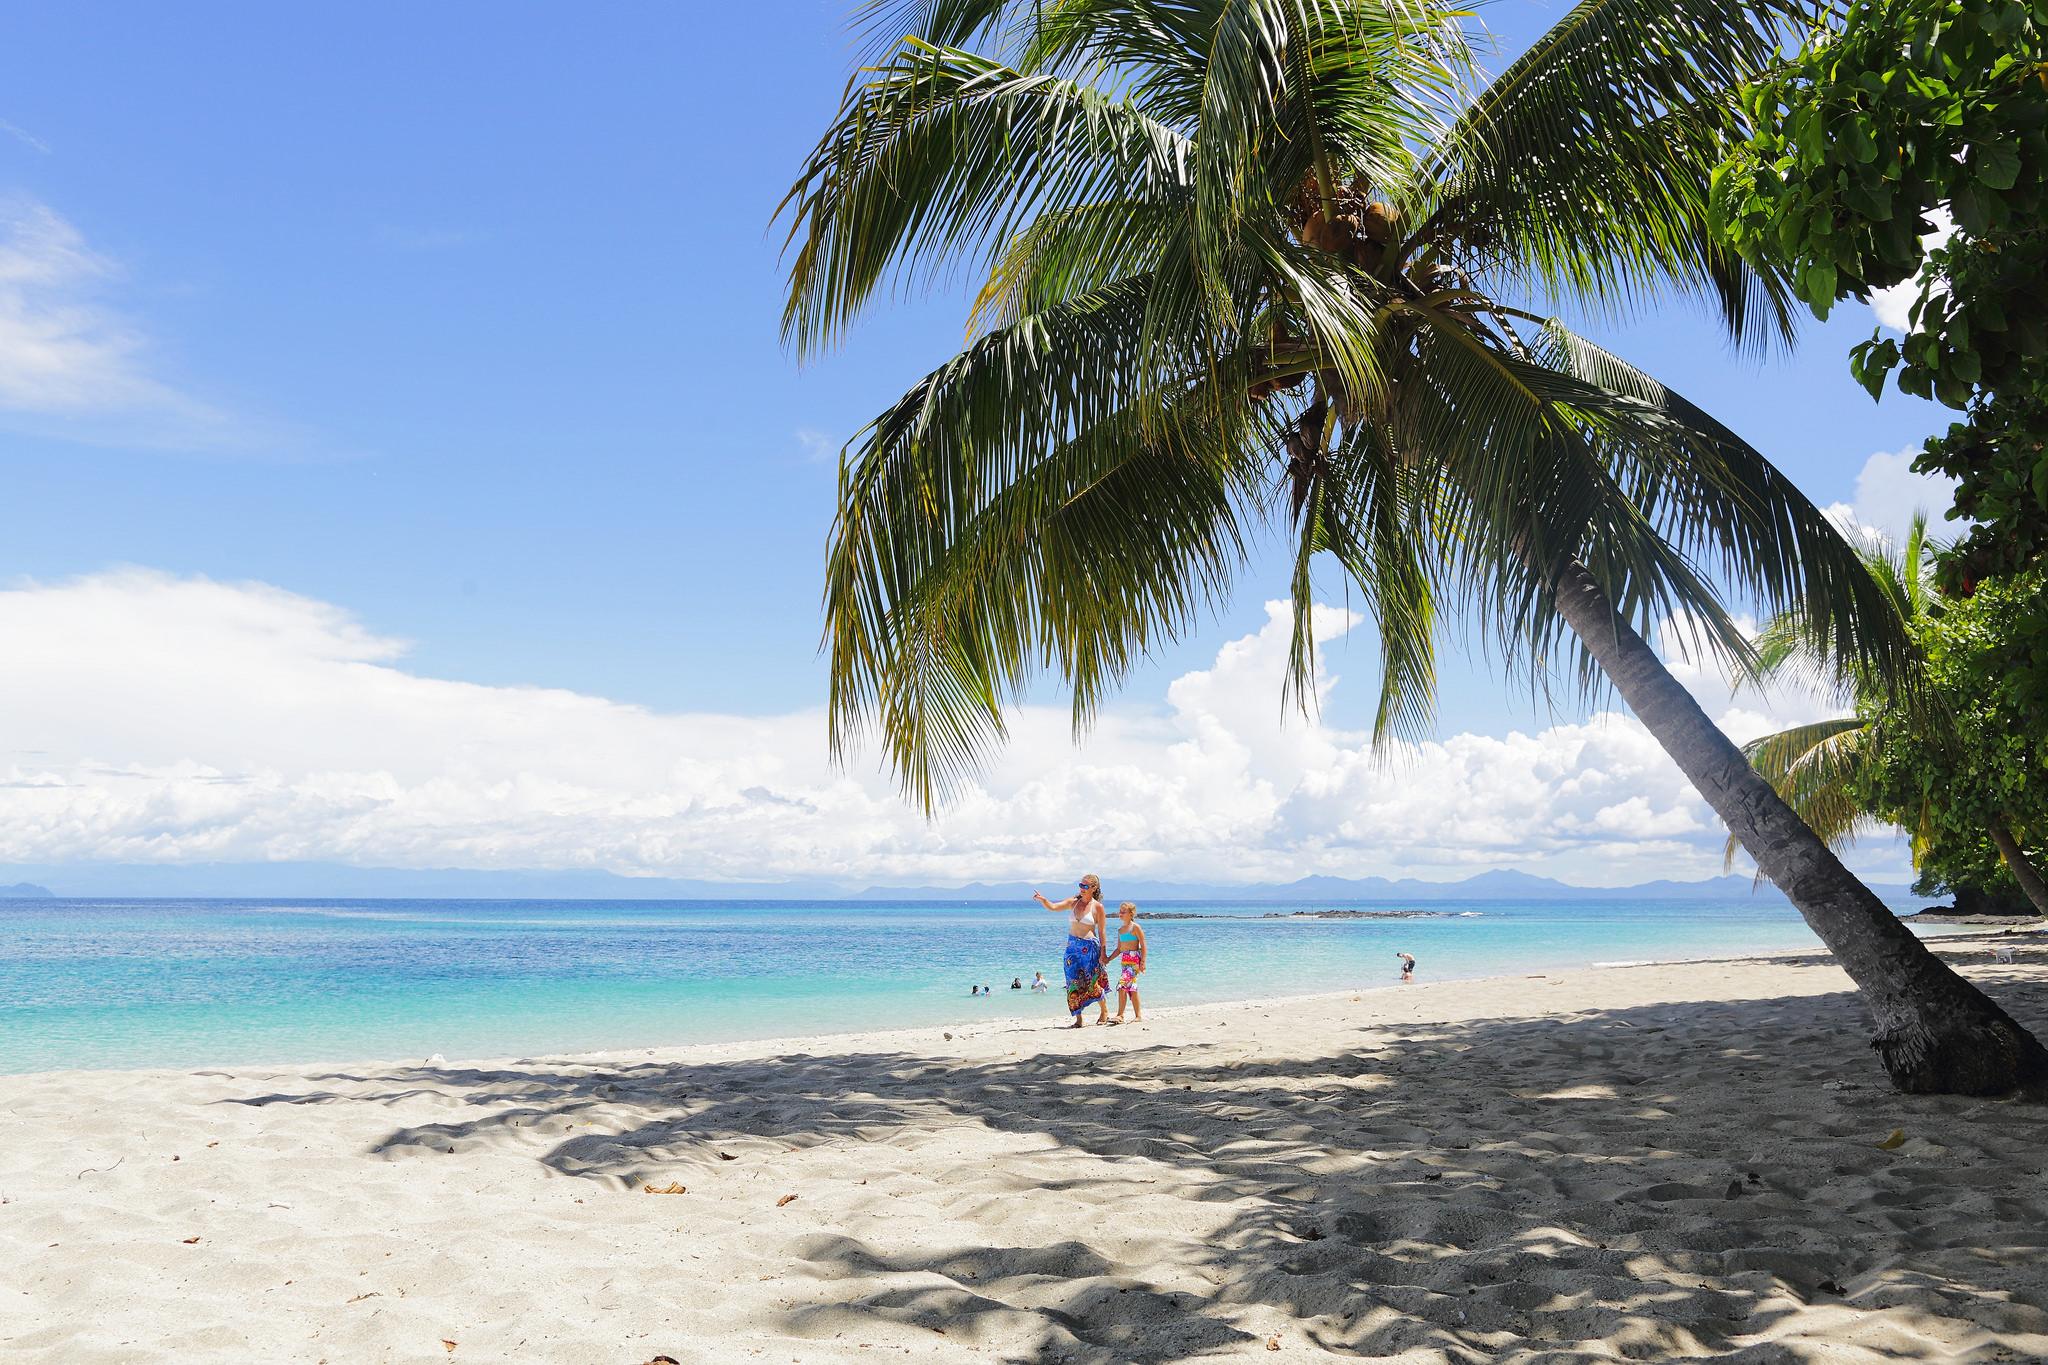 L 39 arcipelago di nosy be un paesaggio di cartolina office national du tourisme de madagascar - Office national du tourisme madagascar ...